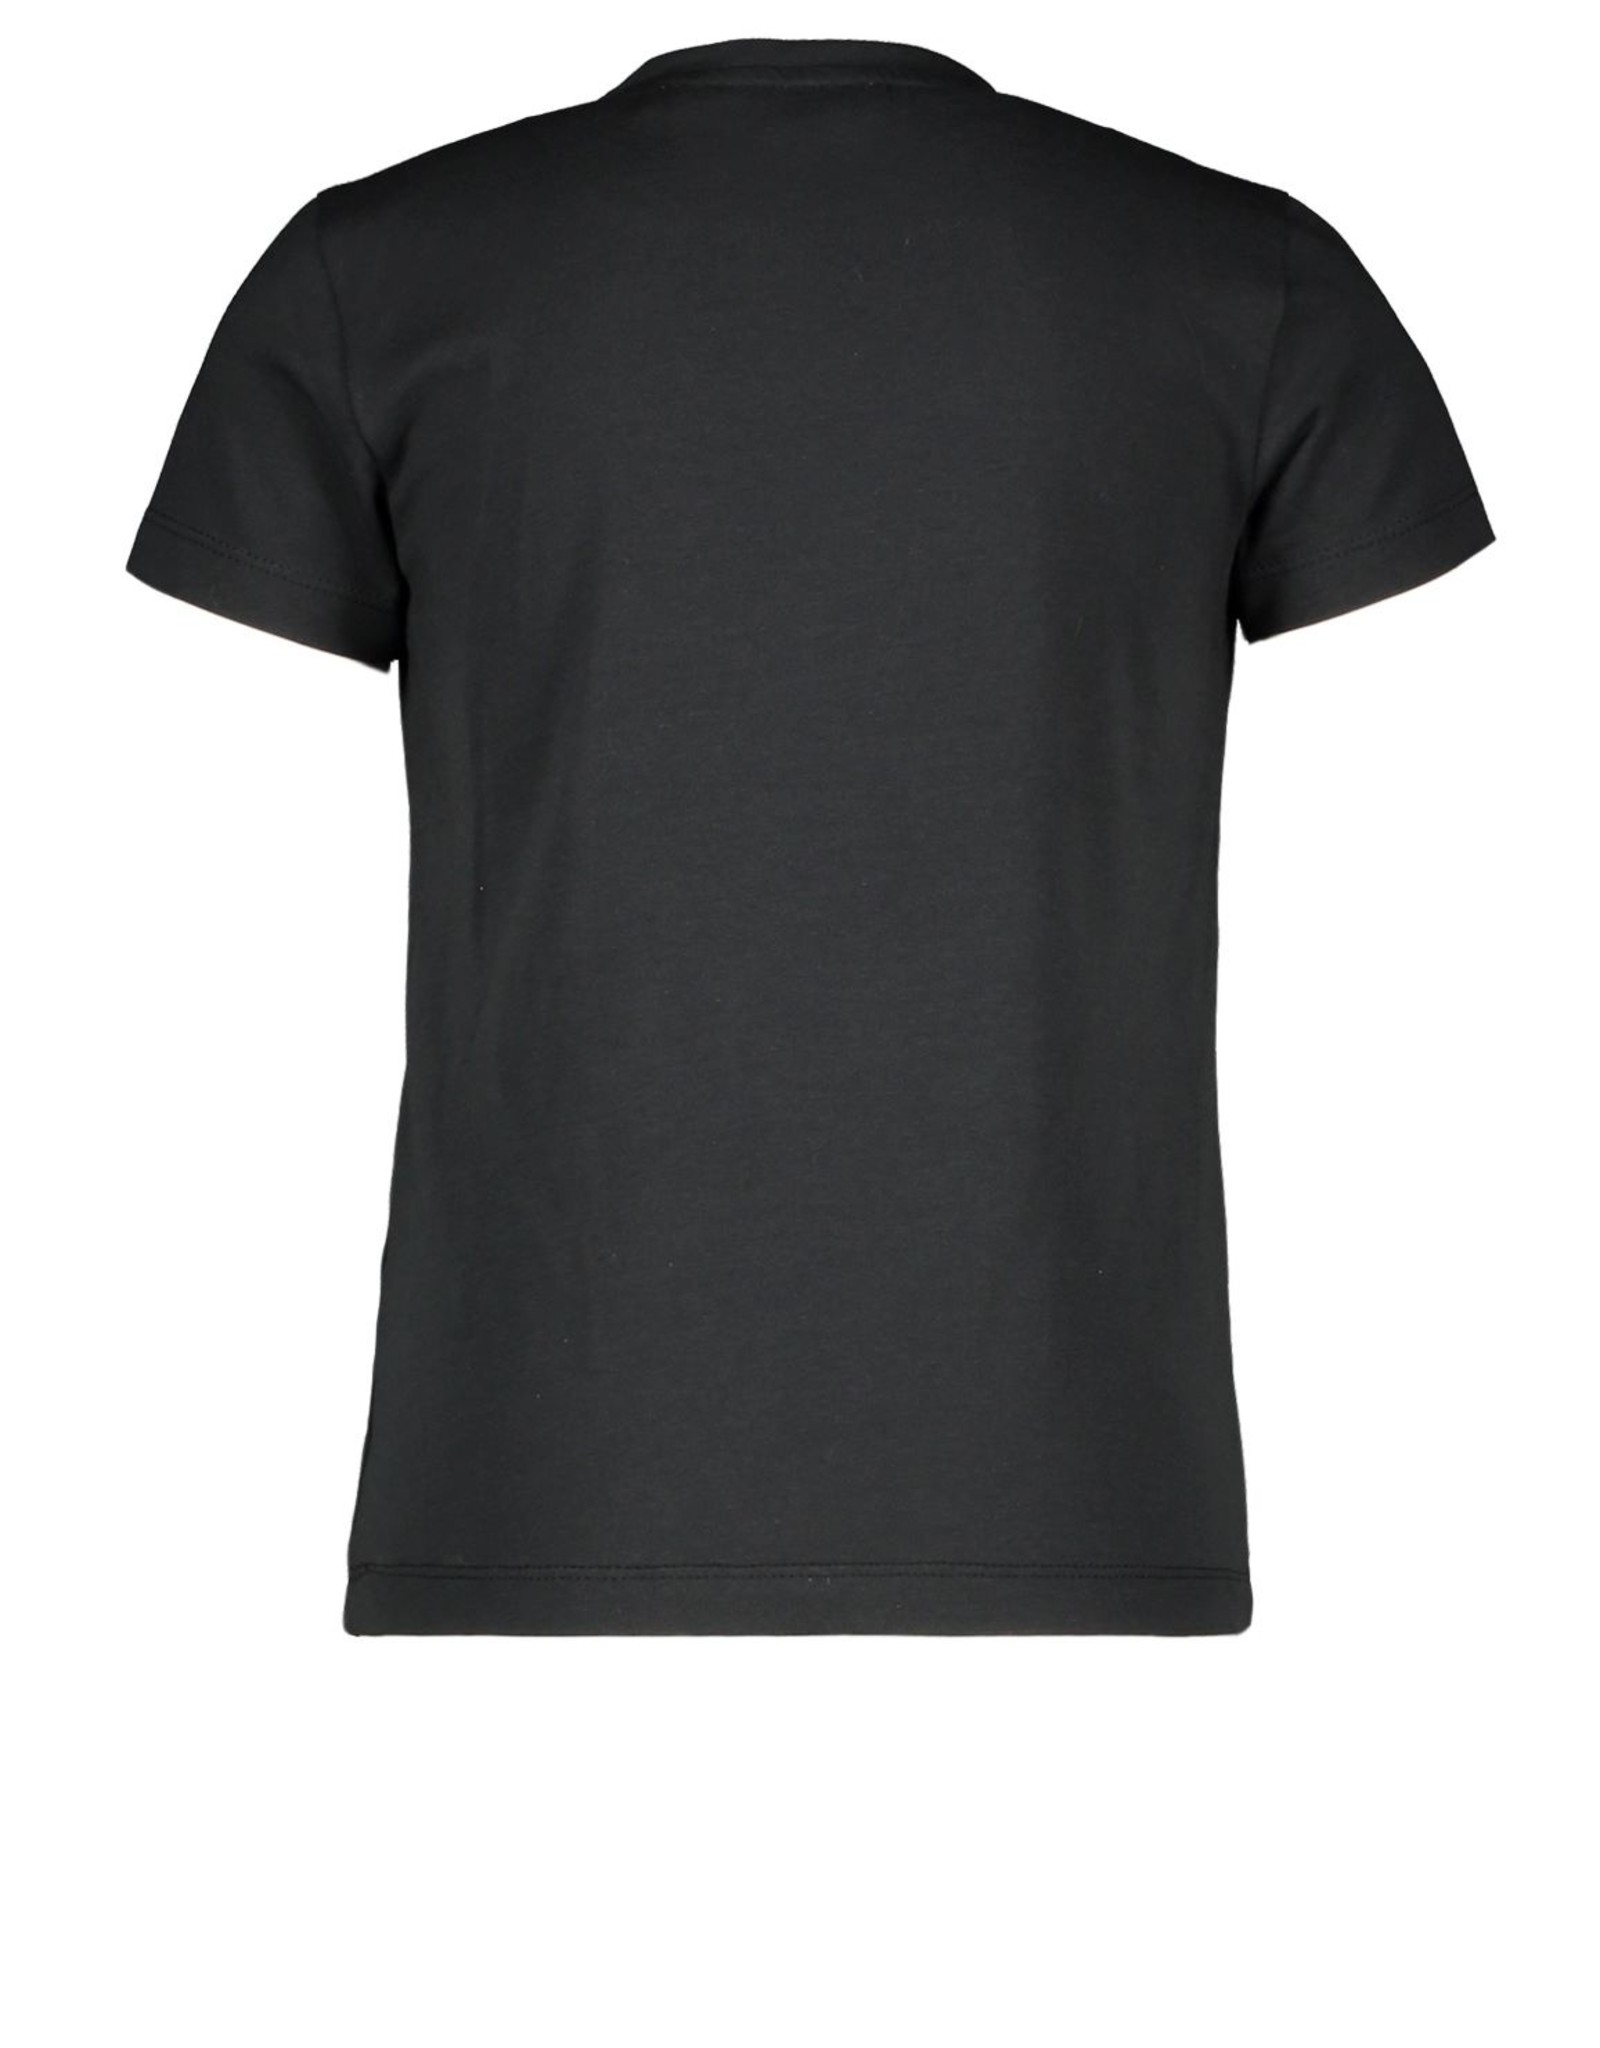 Moodstreet Moodstreet shirt 5400 black